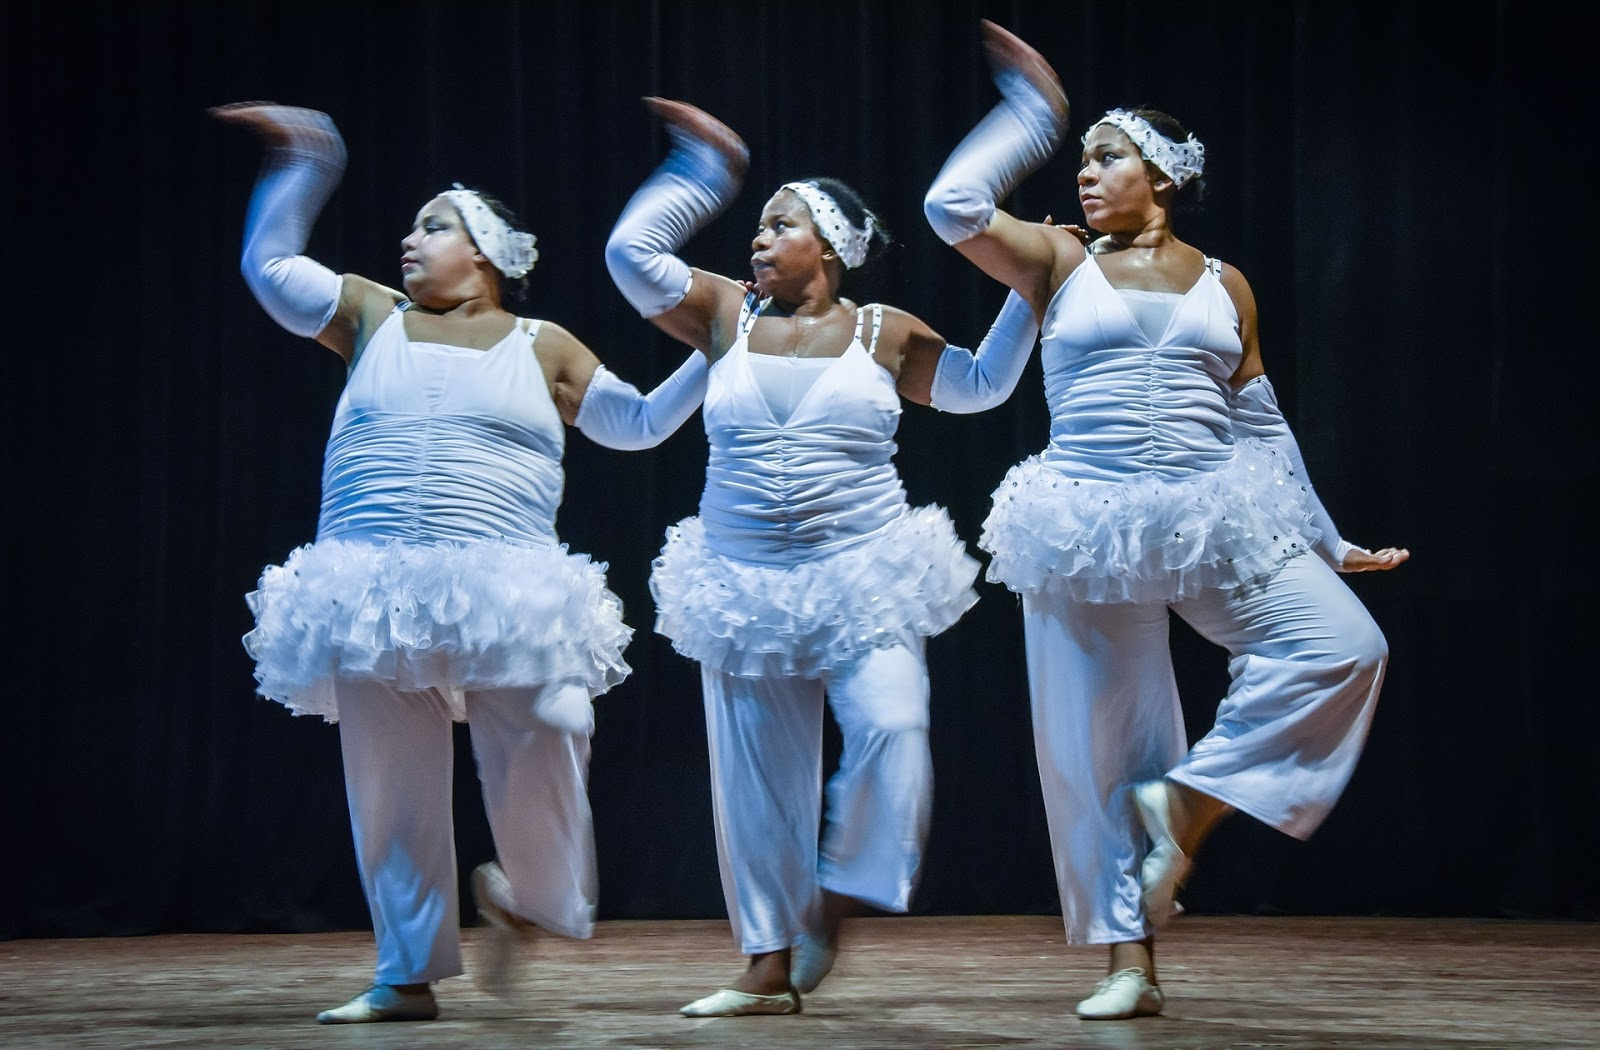 Танцующие толстушки фото, туда и сюда накачали спермой